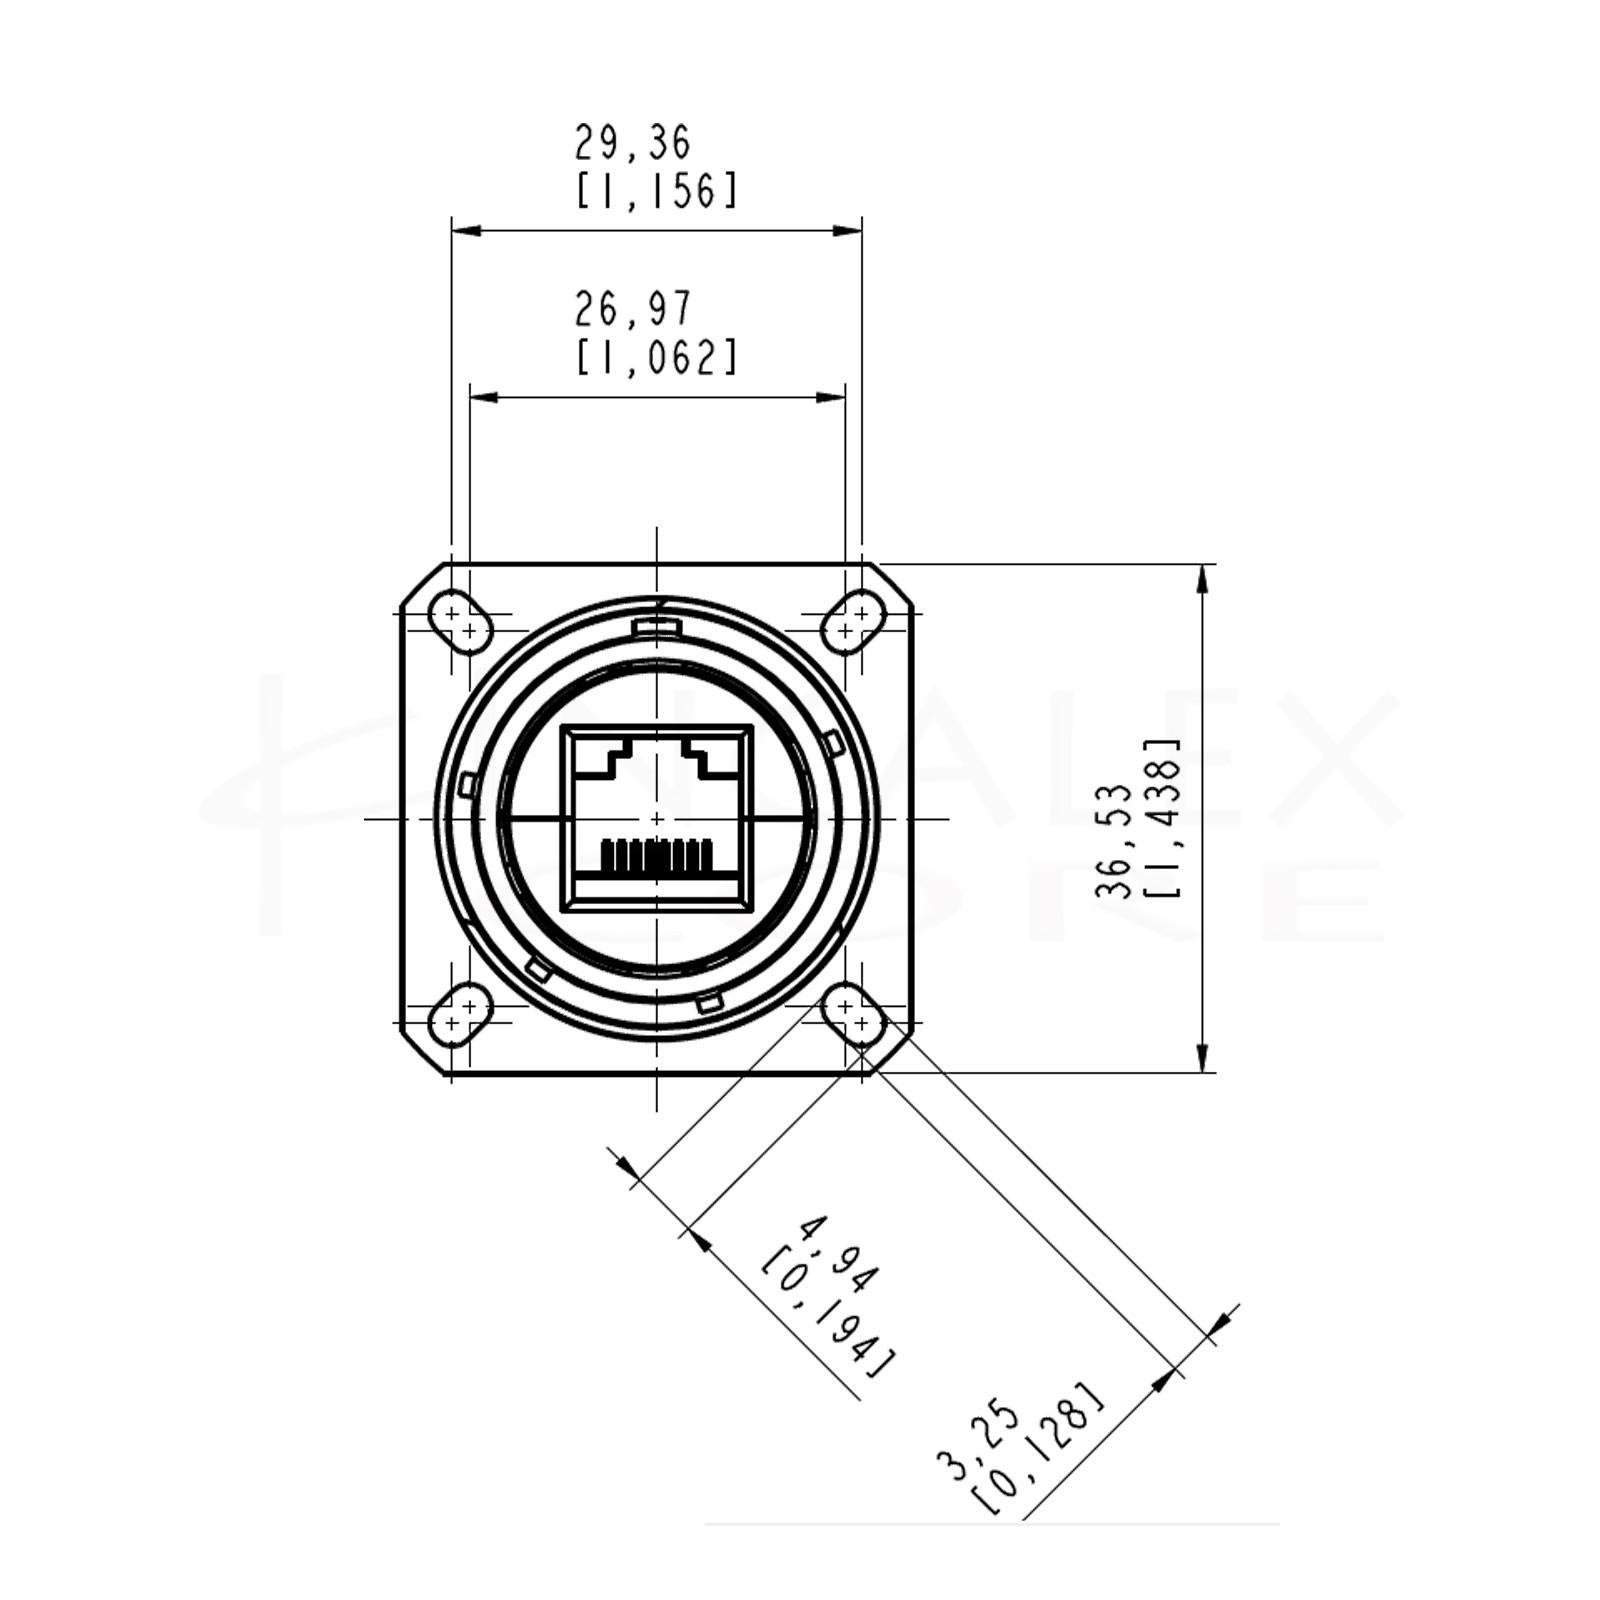 Conector Ethernet Estanco Hembra IP68 ATEX Catx Amphenol RJFTVX2SA1N